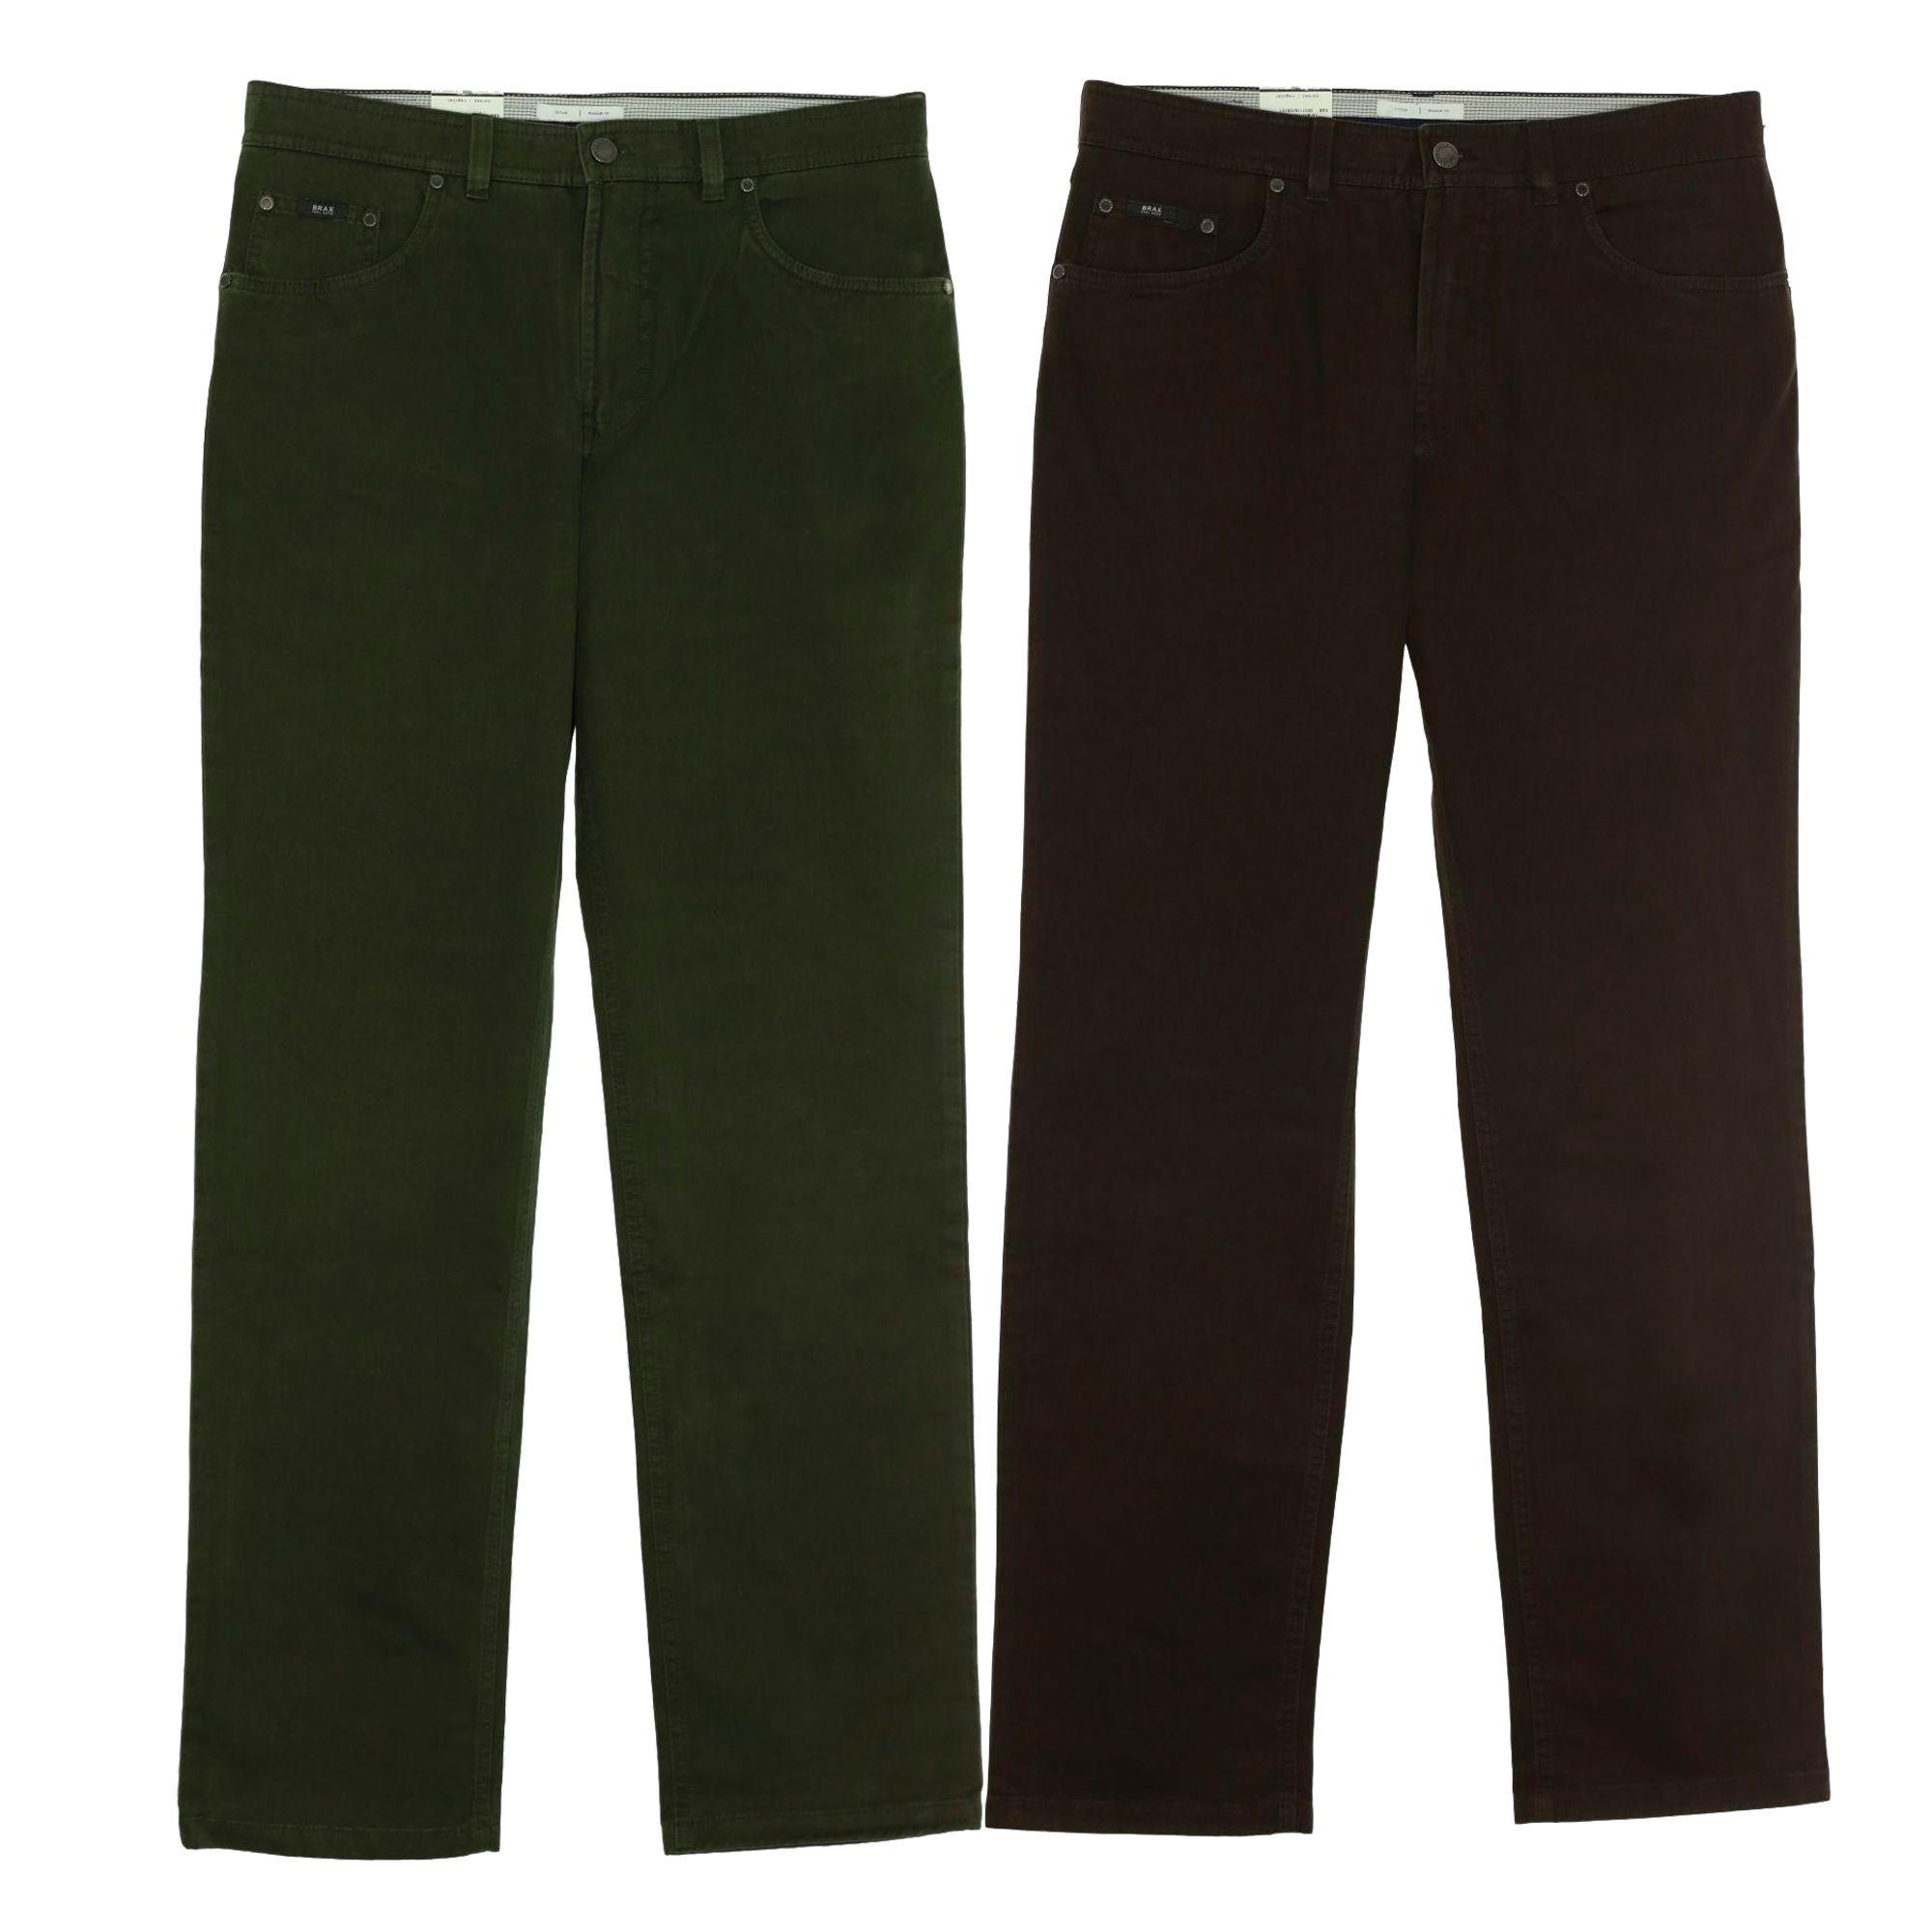 brax jeans cesar herren gabardine atmungsaktiv stretch ebay. Black Bedroom Furniture Sets. Home Design Ideas